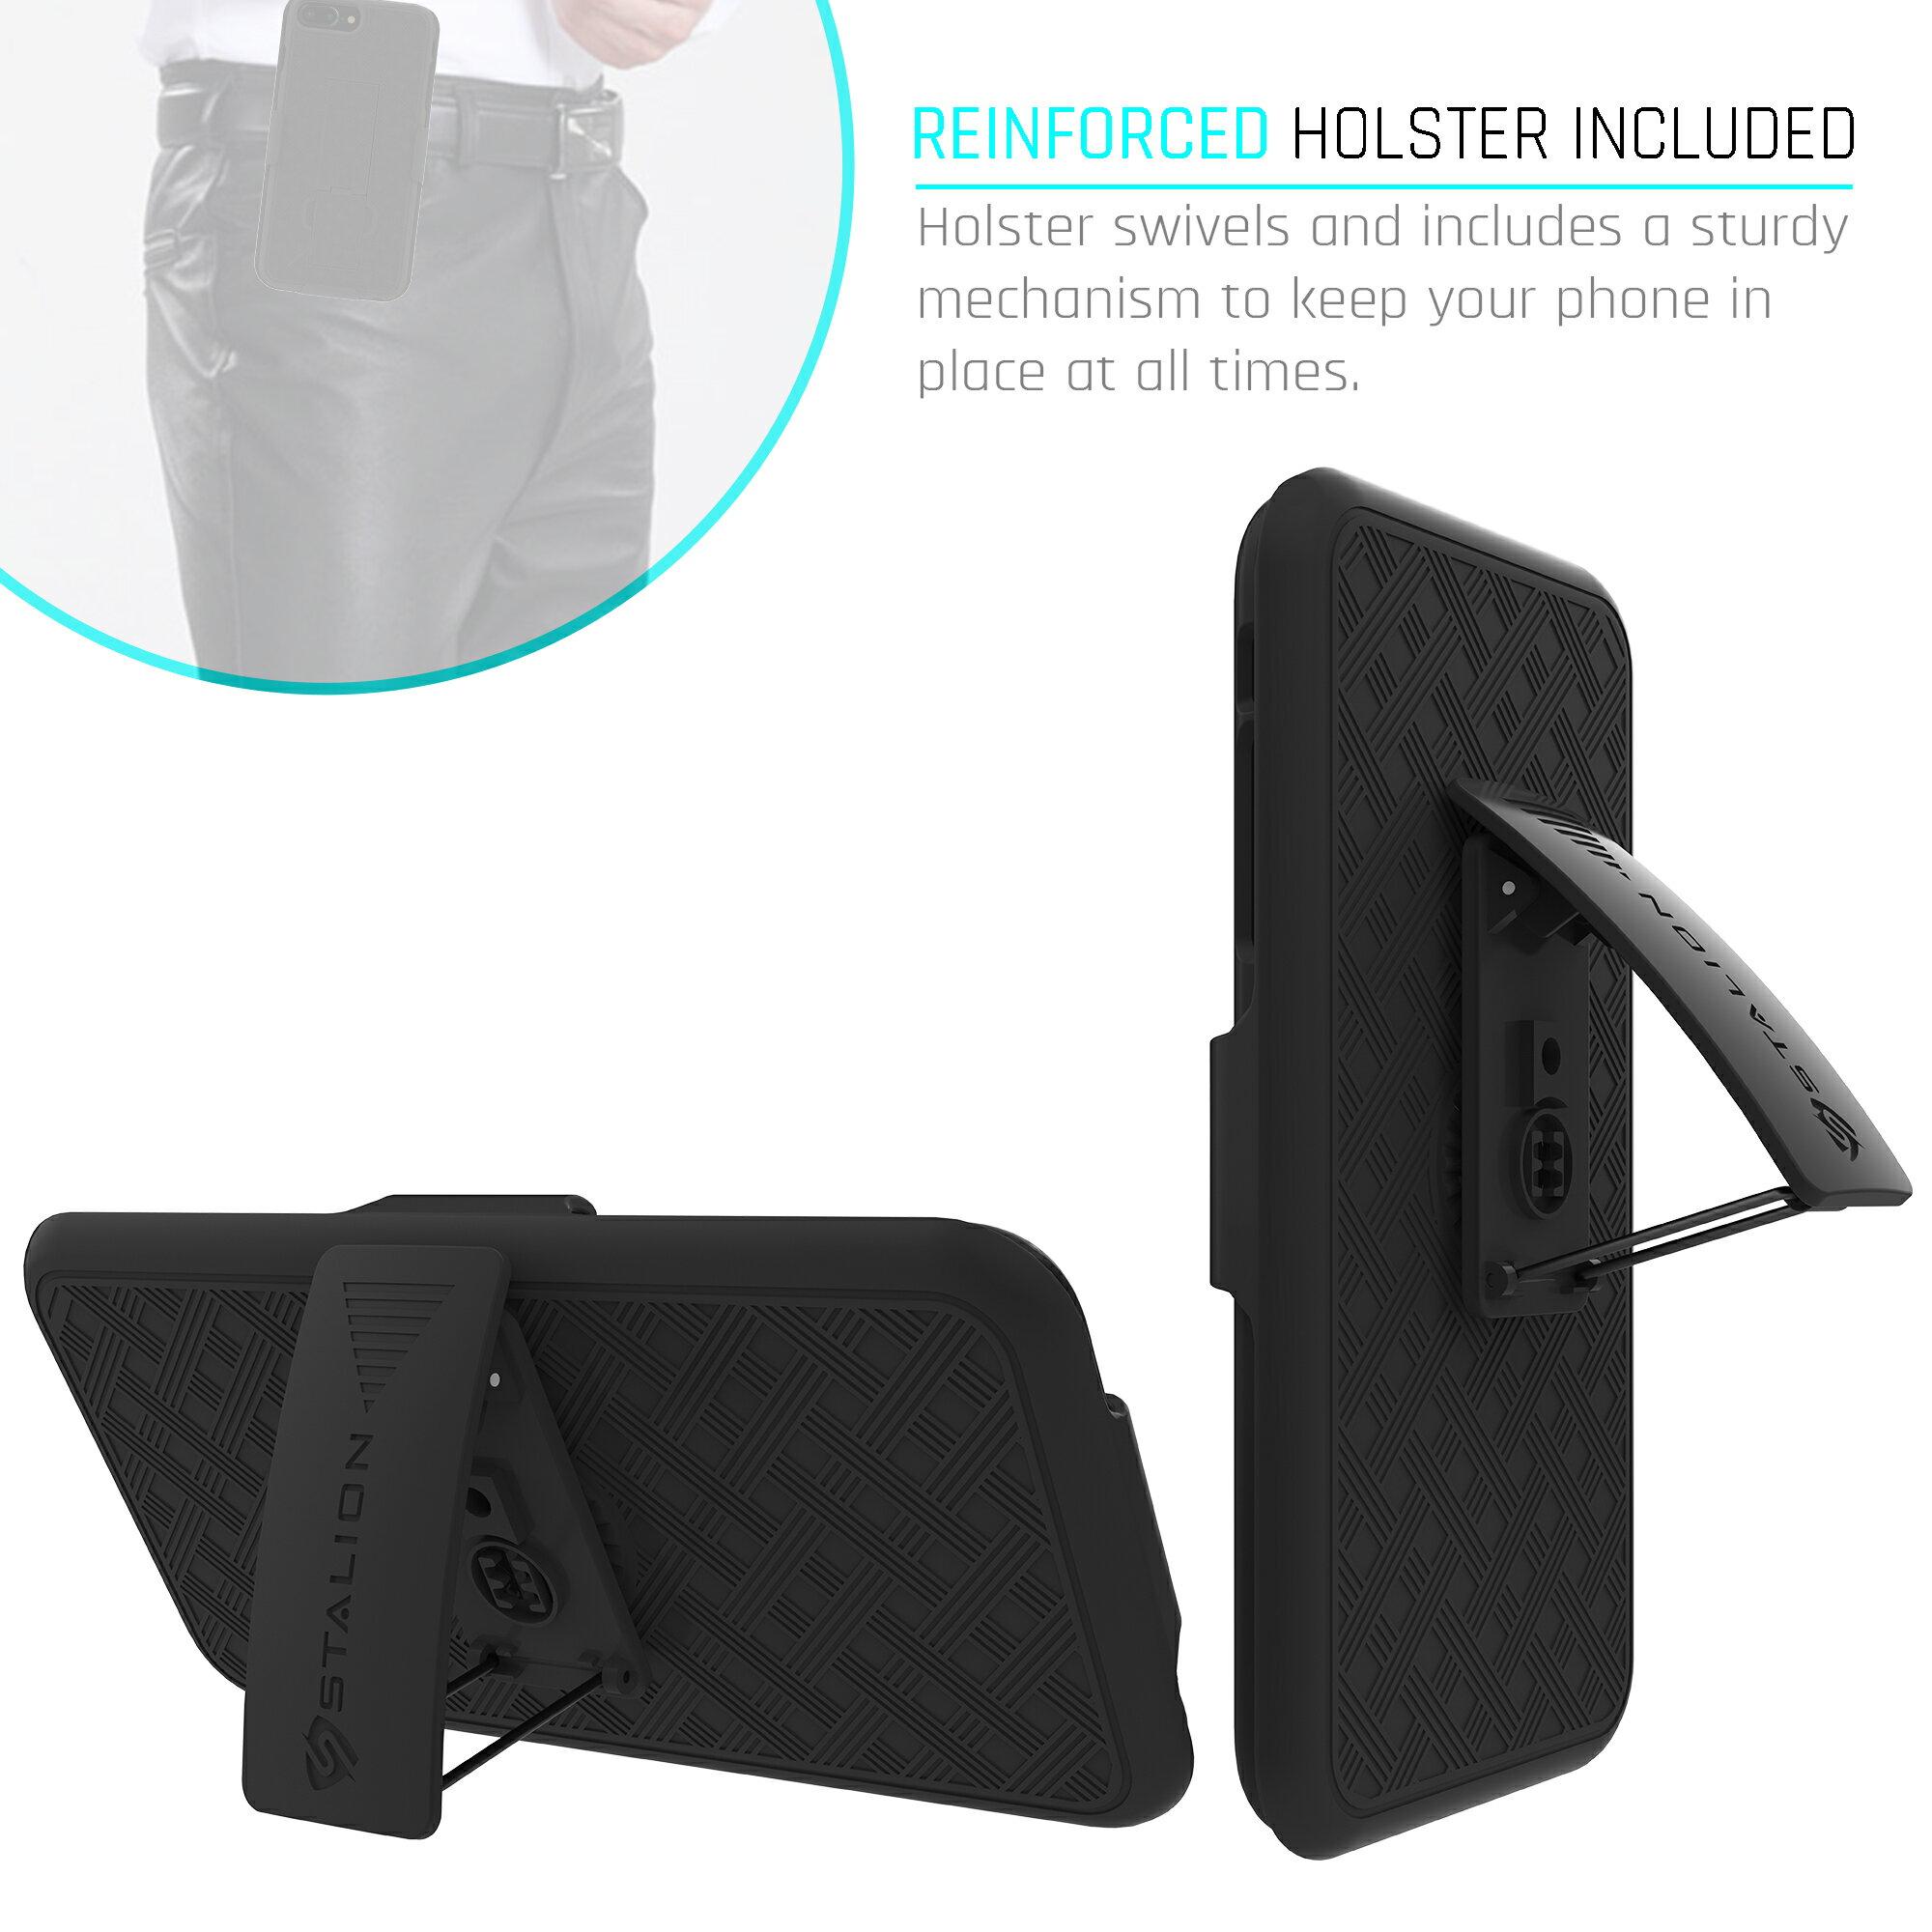 online store 9939a c1a3f Apple iPhone 7 Plus Holster Case & Belt Clip Combo